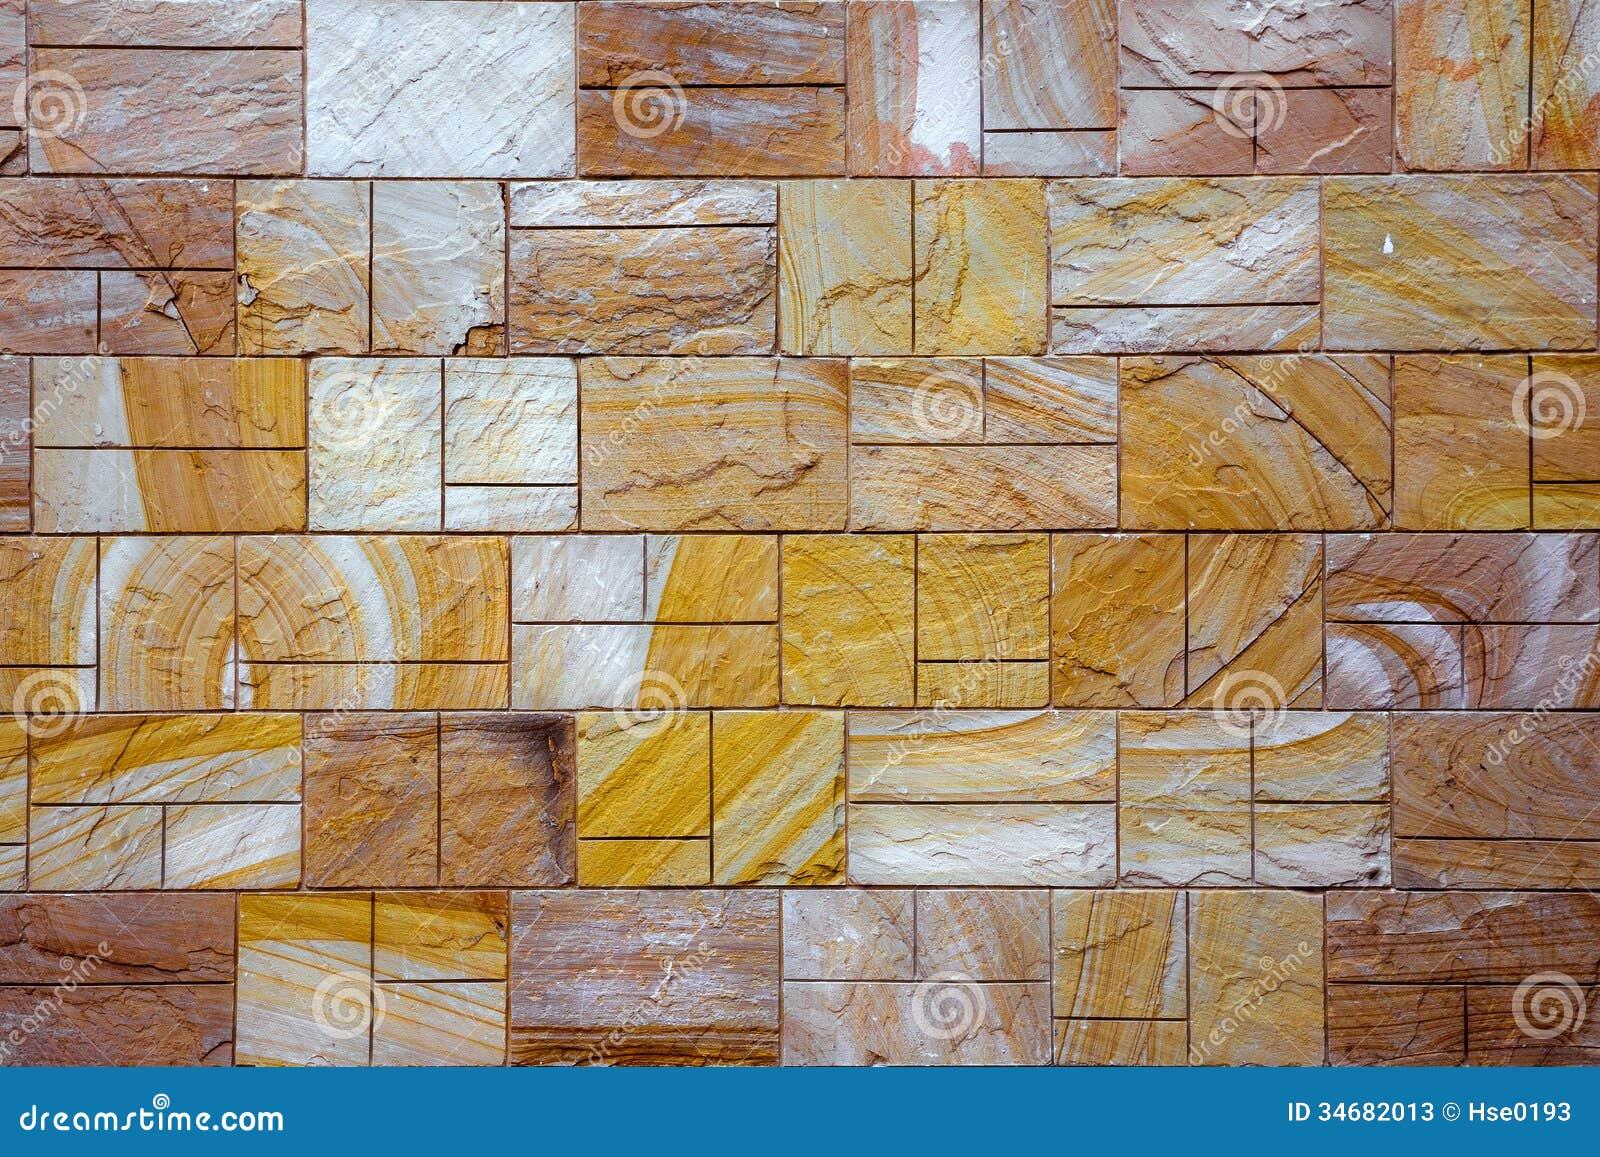 Decorative Brick Walls : Rustic tile brick wall stock image of